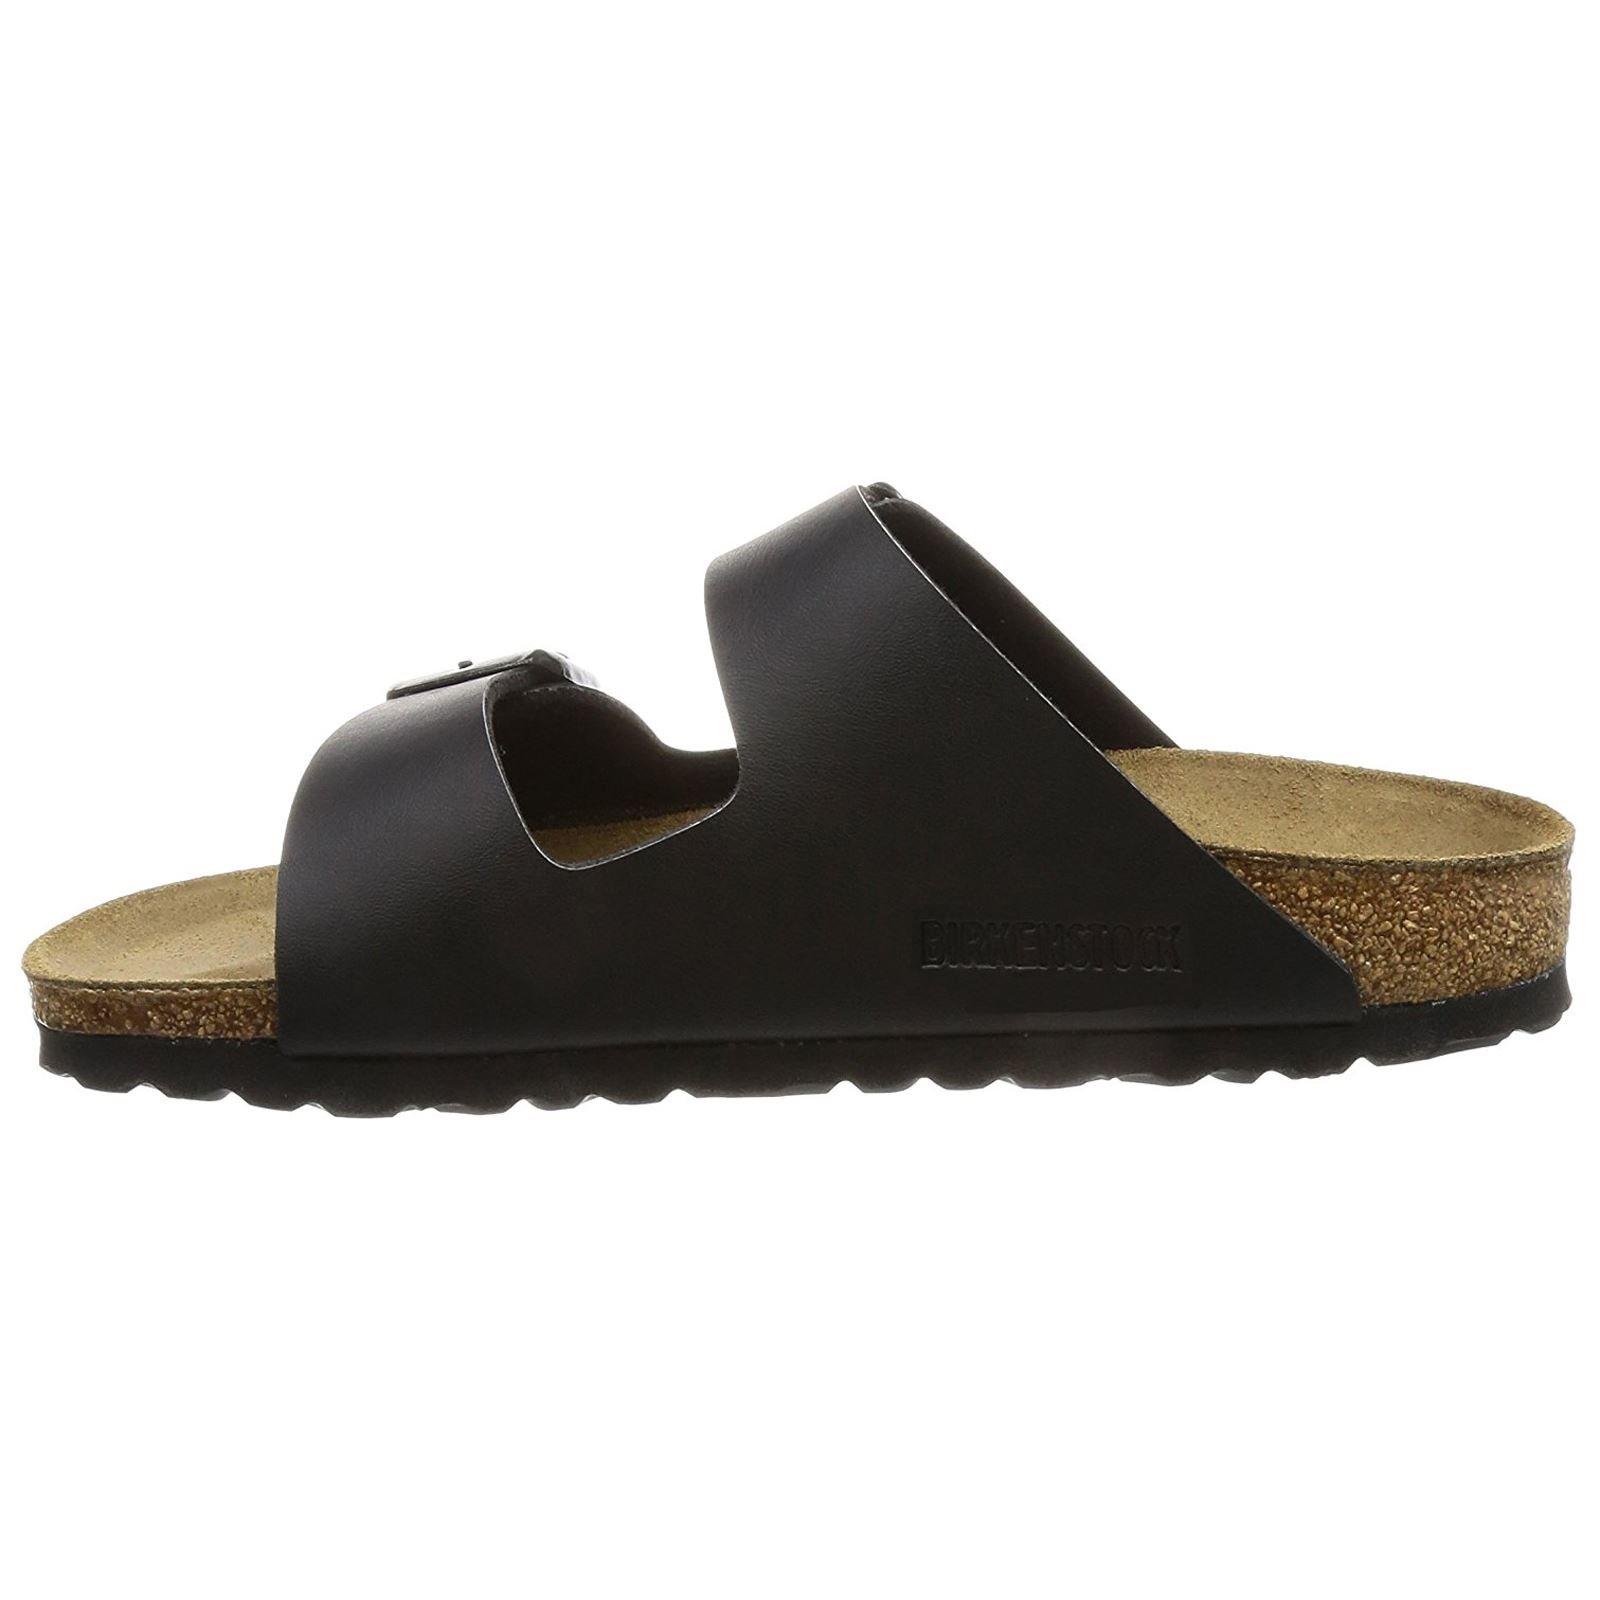 Birkenstock Womens Arizona Black Leather Sandals 37 EU